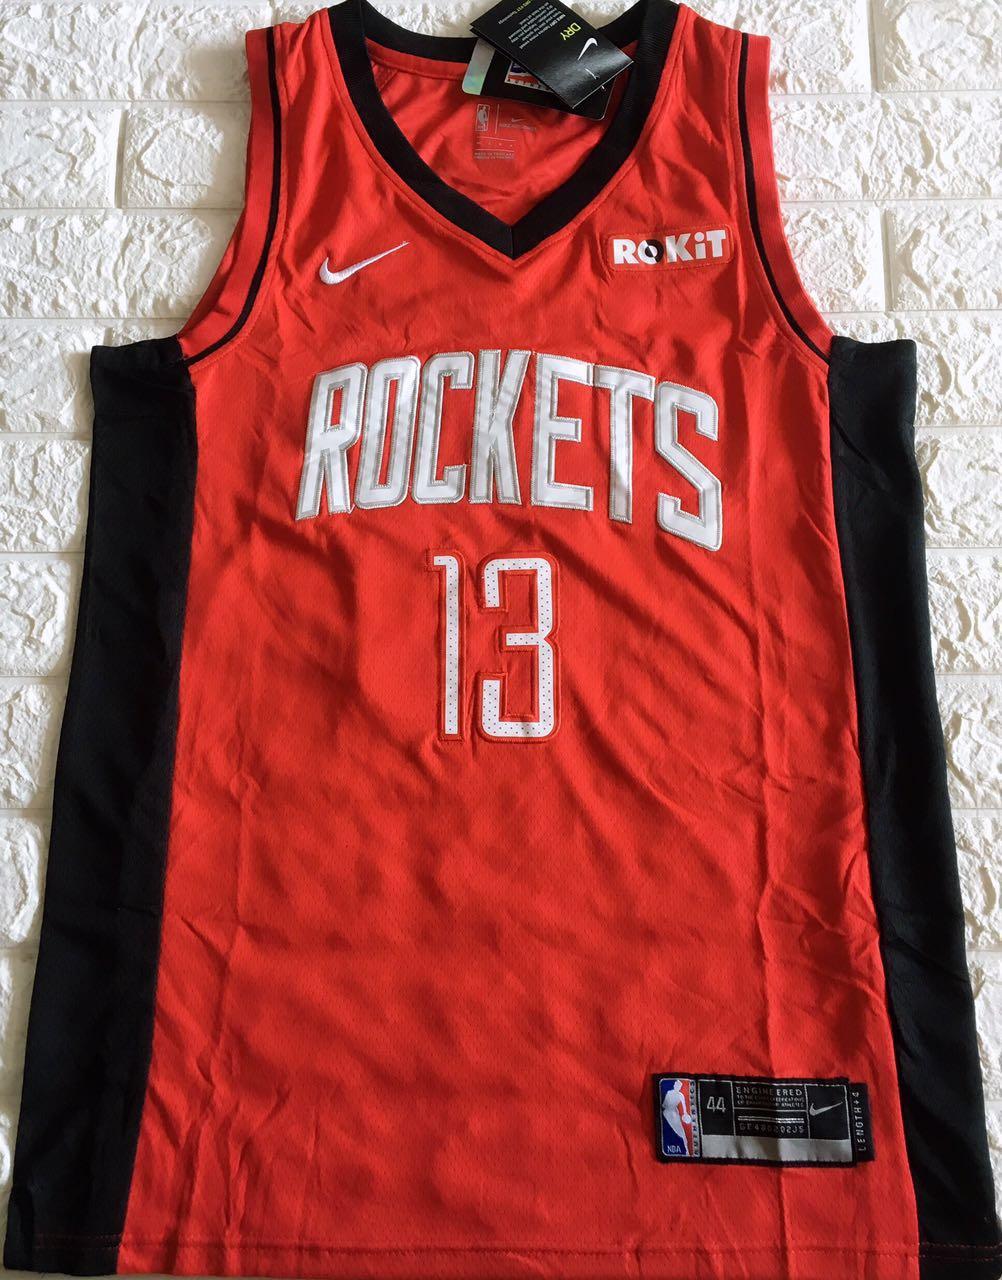 newest collection 4b1a0 68d4b nba basketball HOUSTON ROCKETS #13 HARDEN jersey